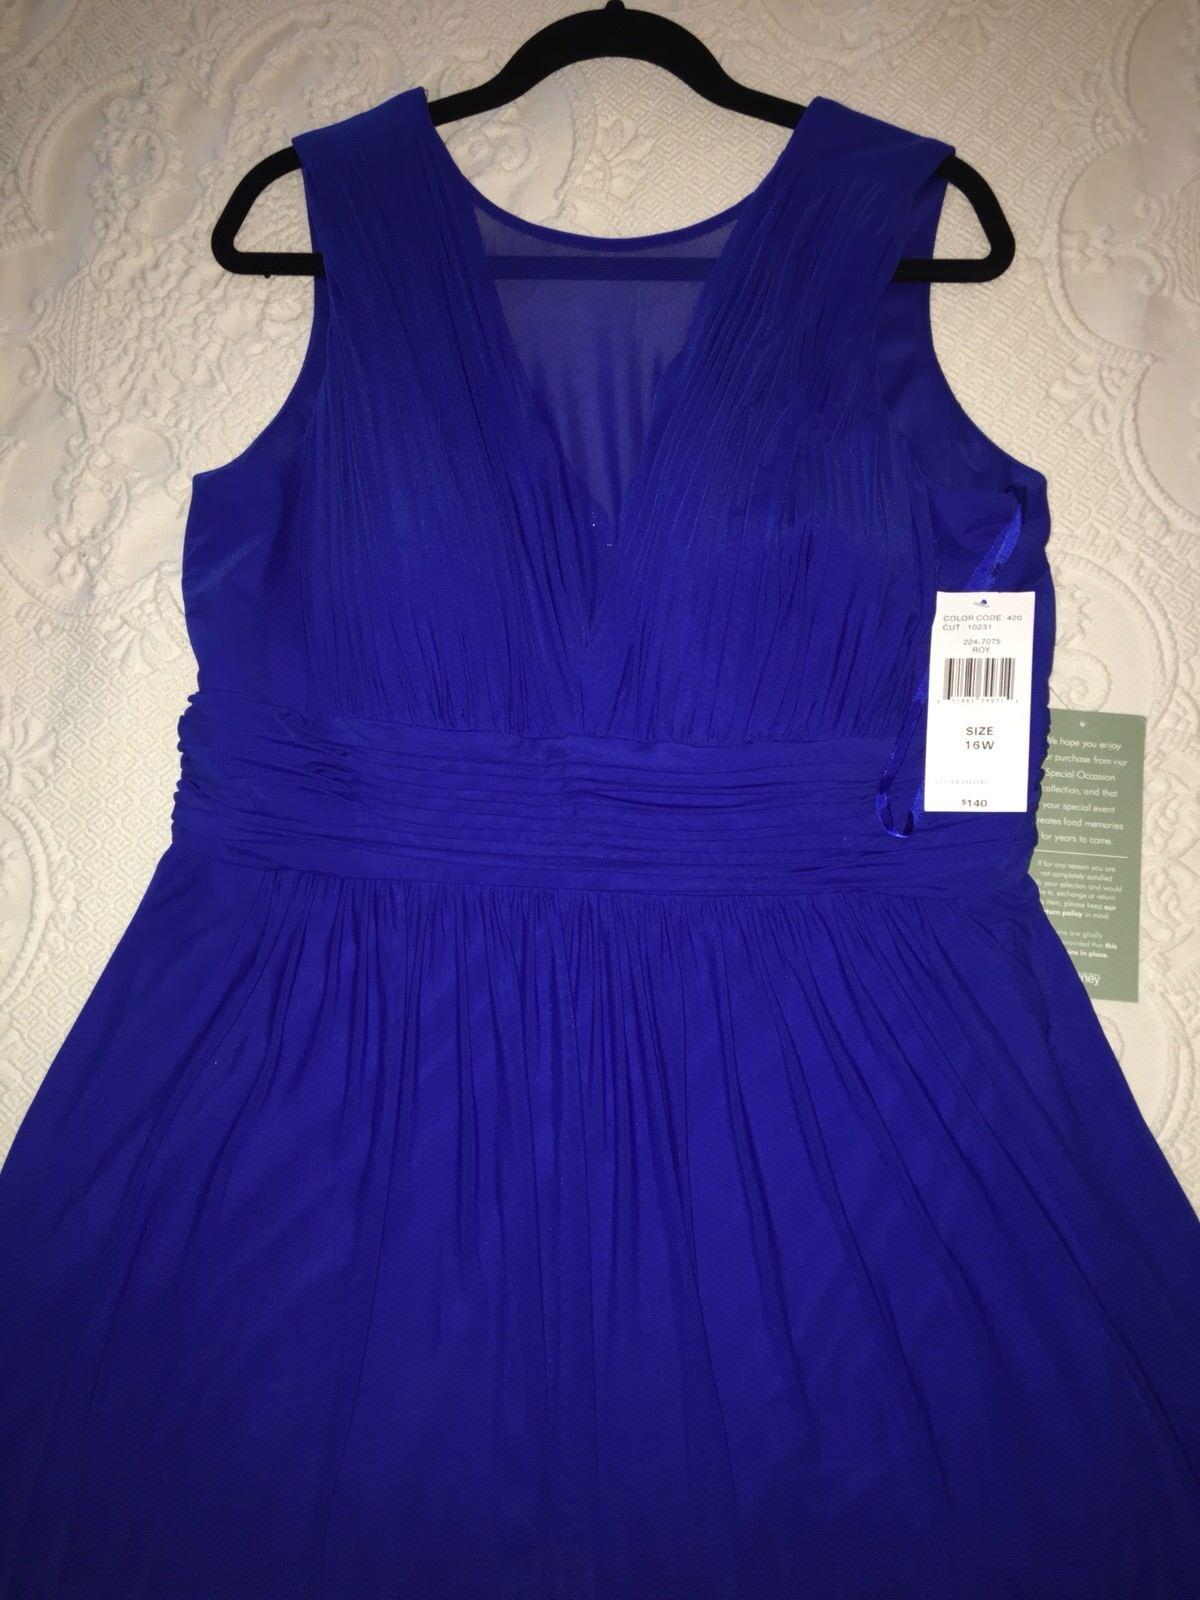 NWT Blau Sage Plus Größe Stretch Mesh Illusion  Draped V-neck Maxi Dress 16W